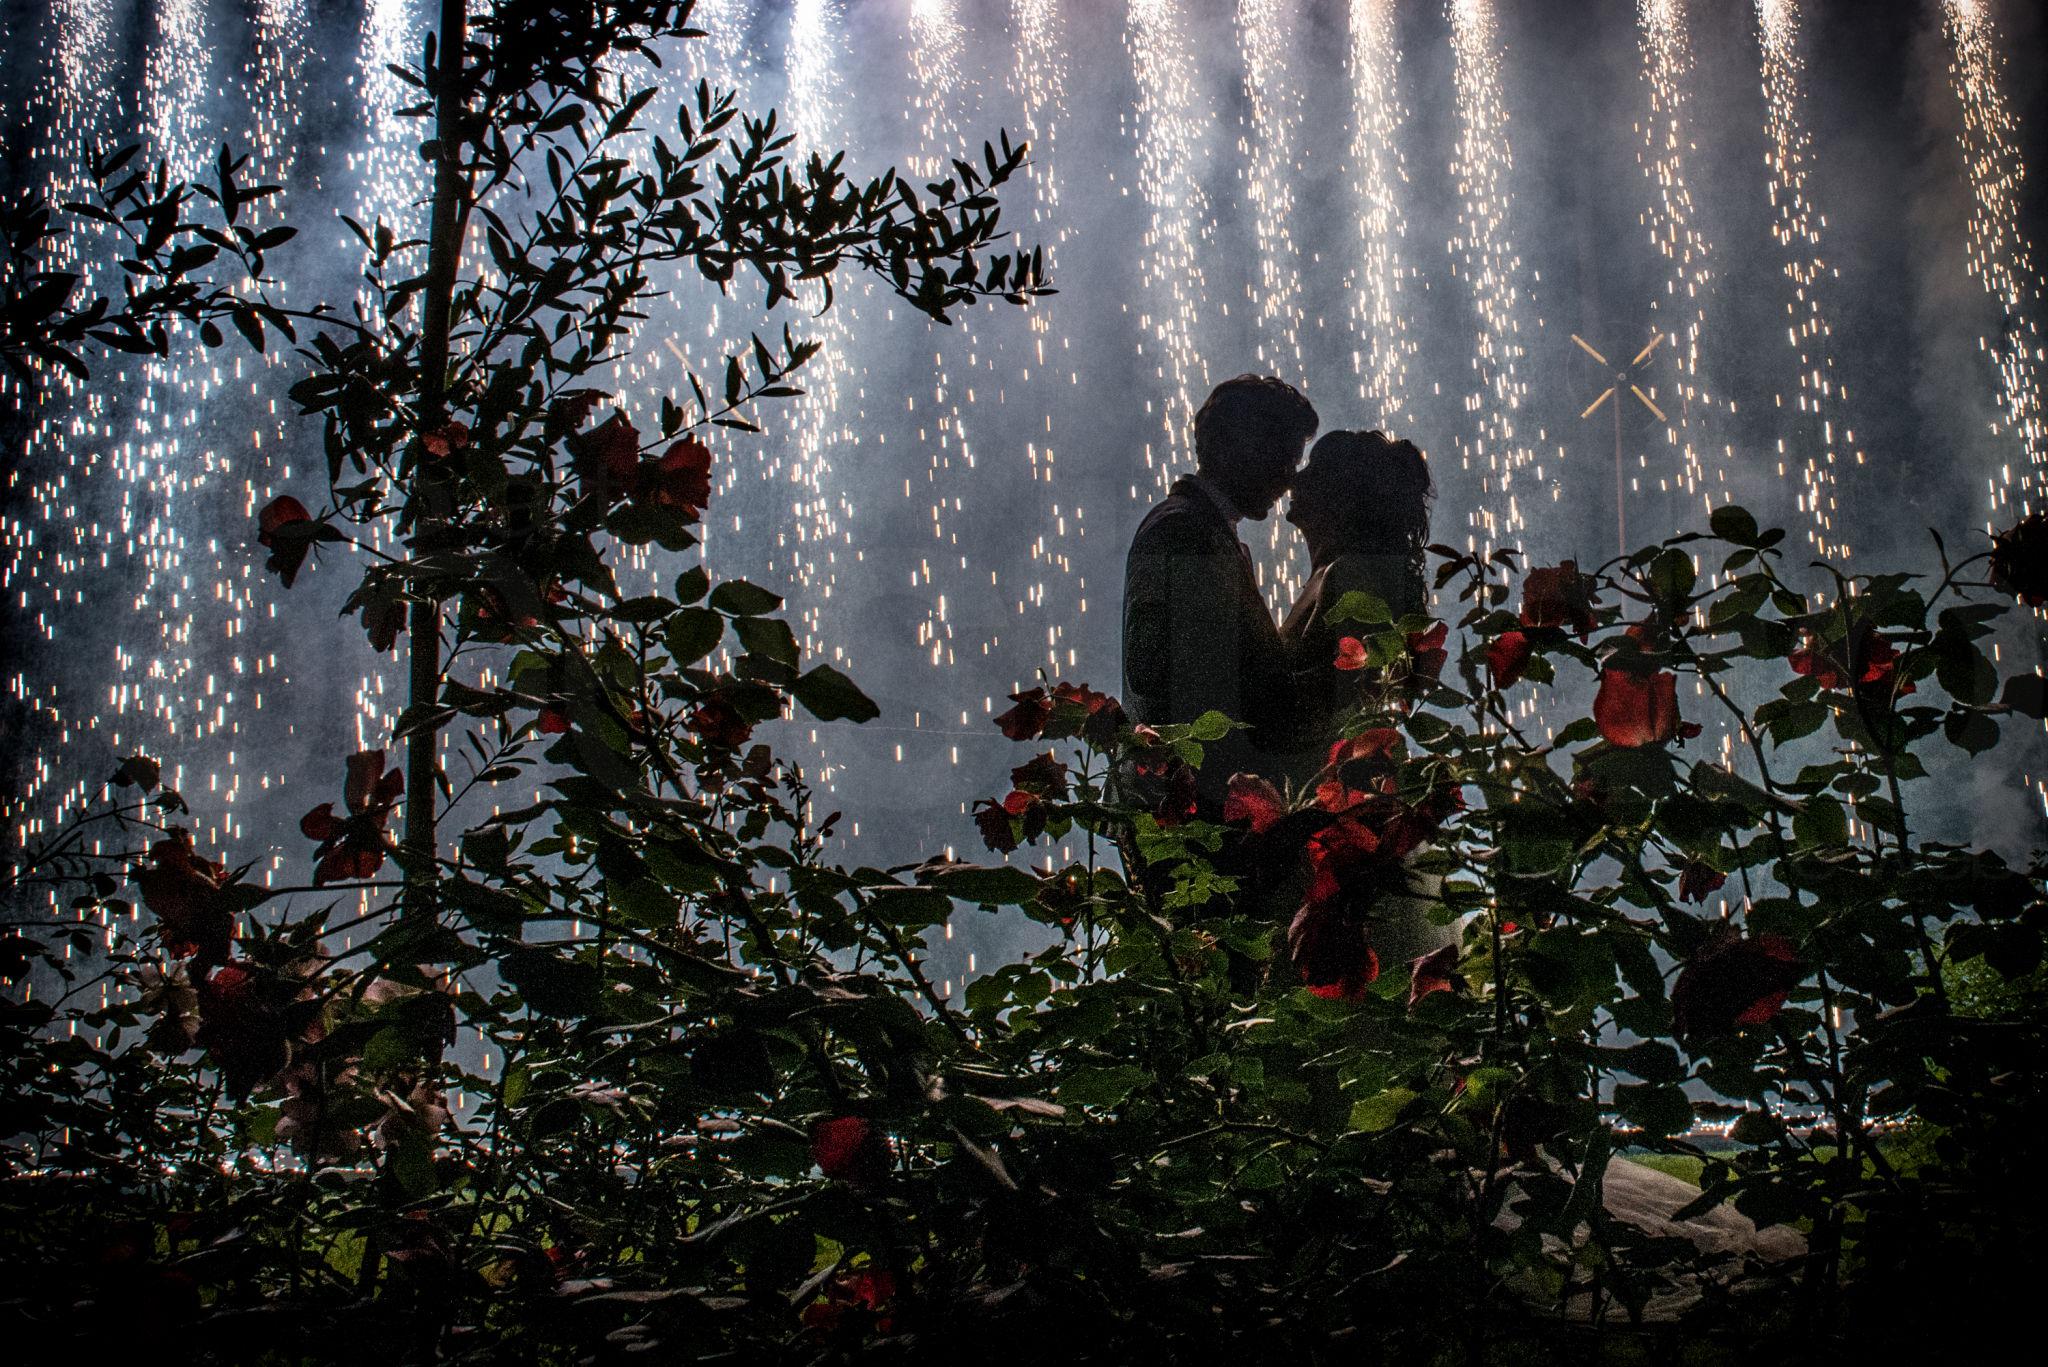 http://lnx.mirkone.it/wp-content/uploads/2015/07/fotografo-matrimoni-faenza-0025.jpg